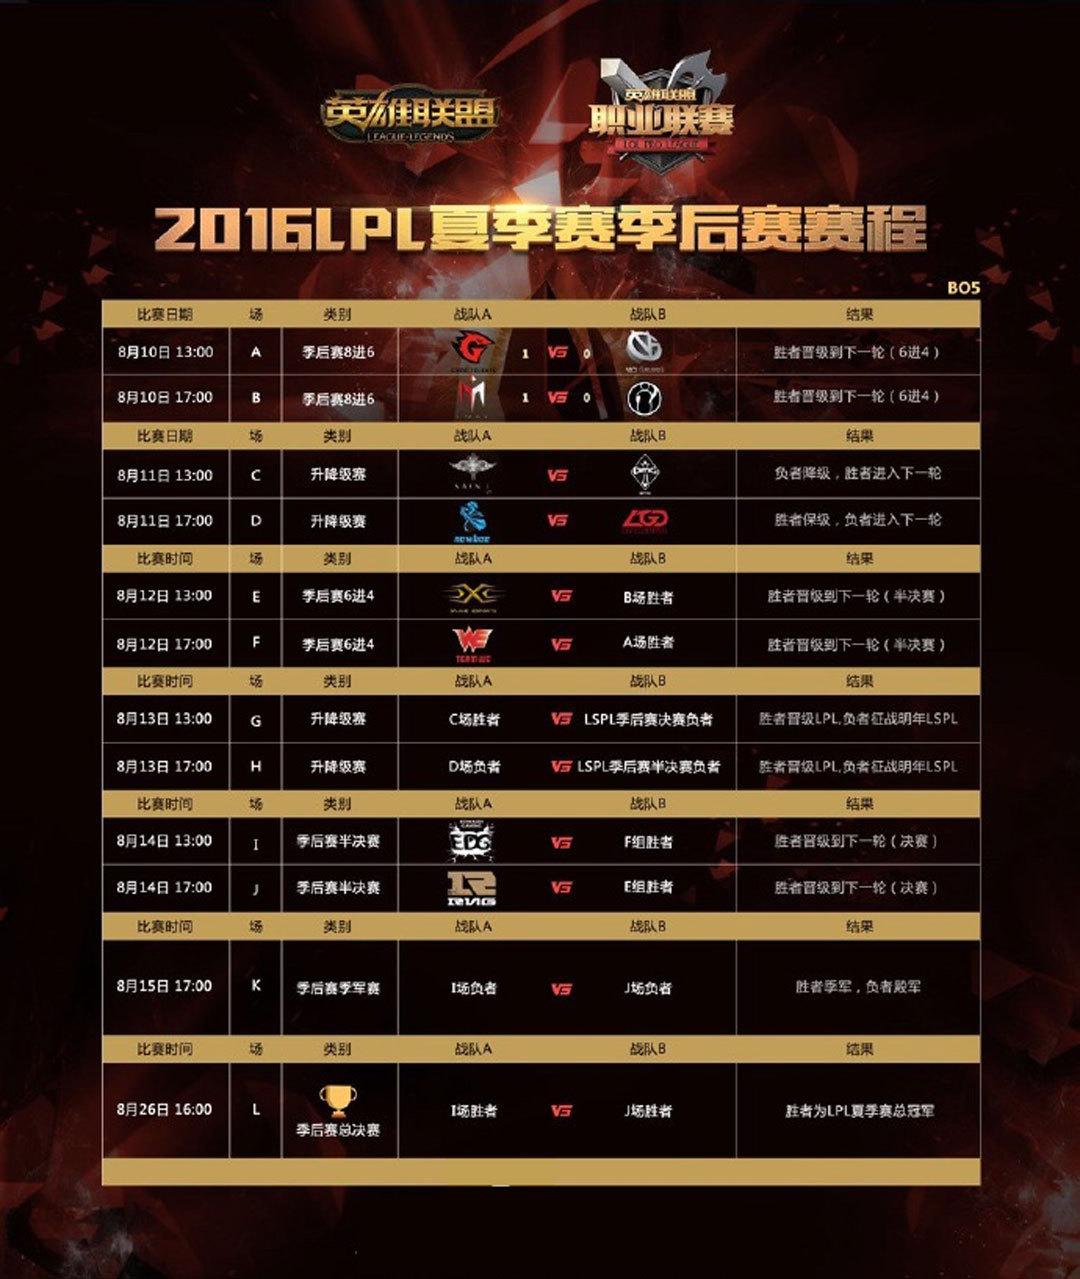 2016LPL夏季赛季后赛赛程出炉